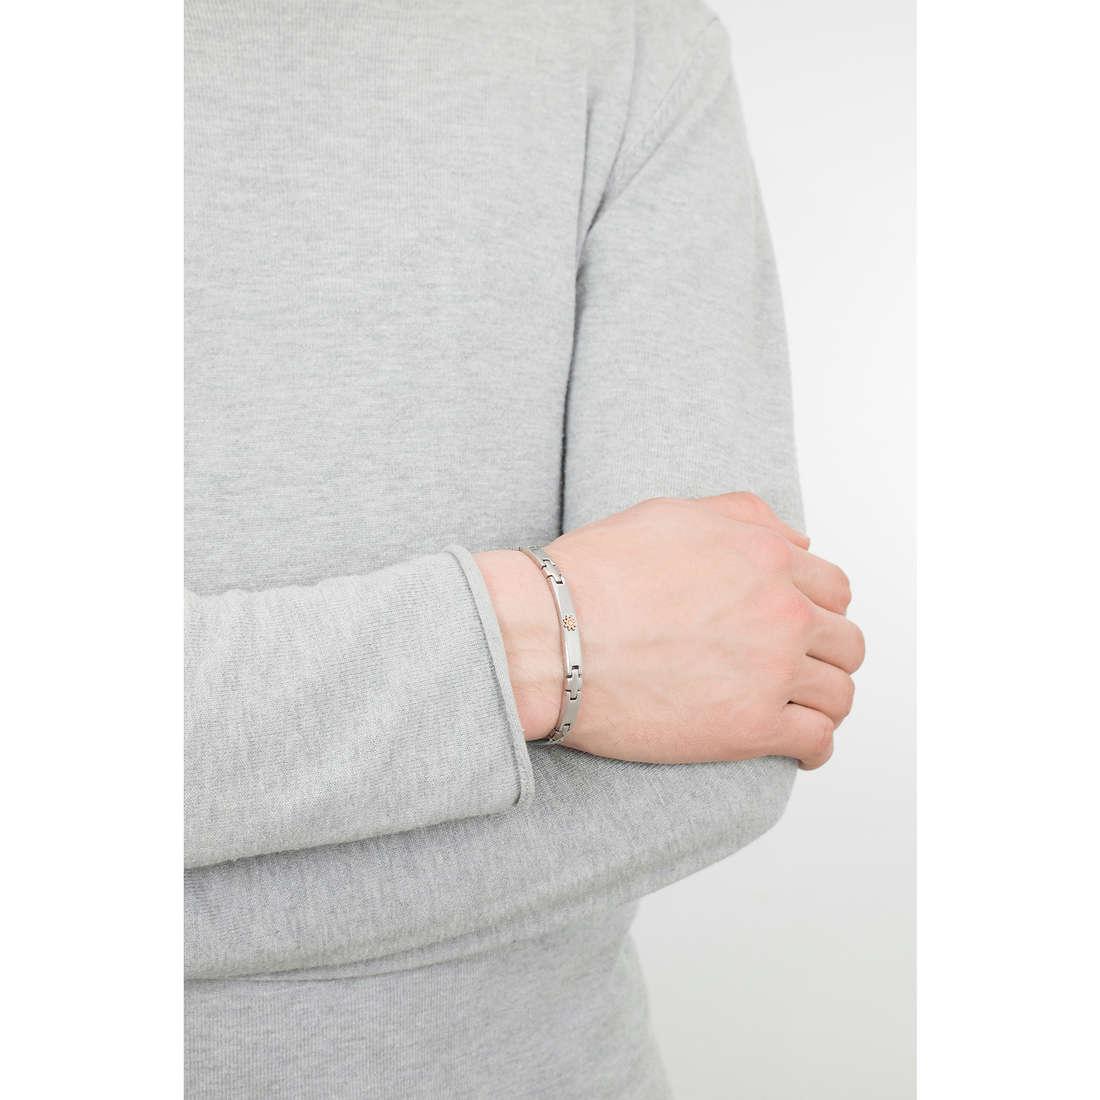 Luca Barra bracciali uomo LBBA717 indosso